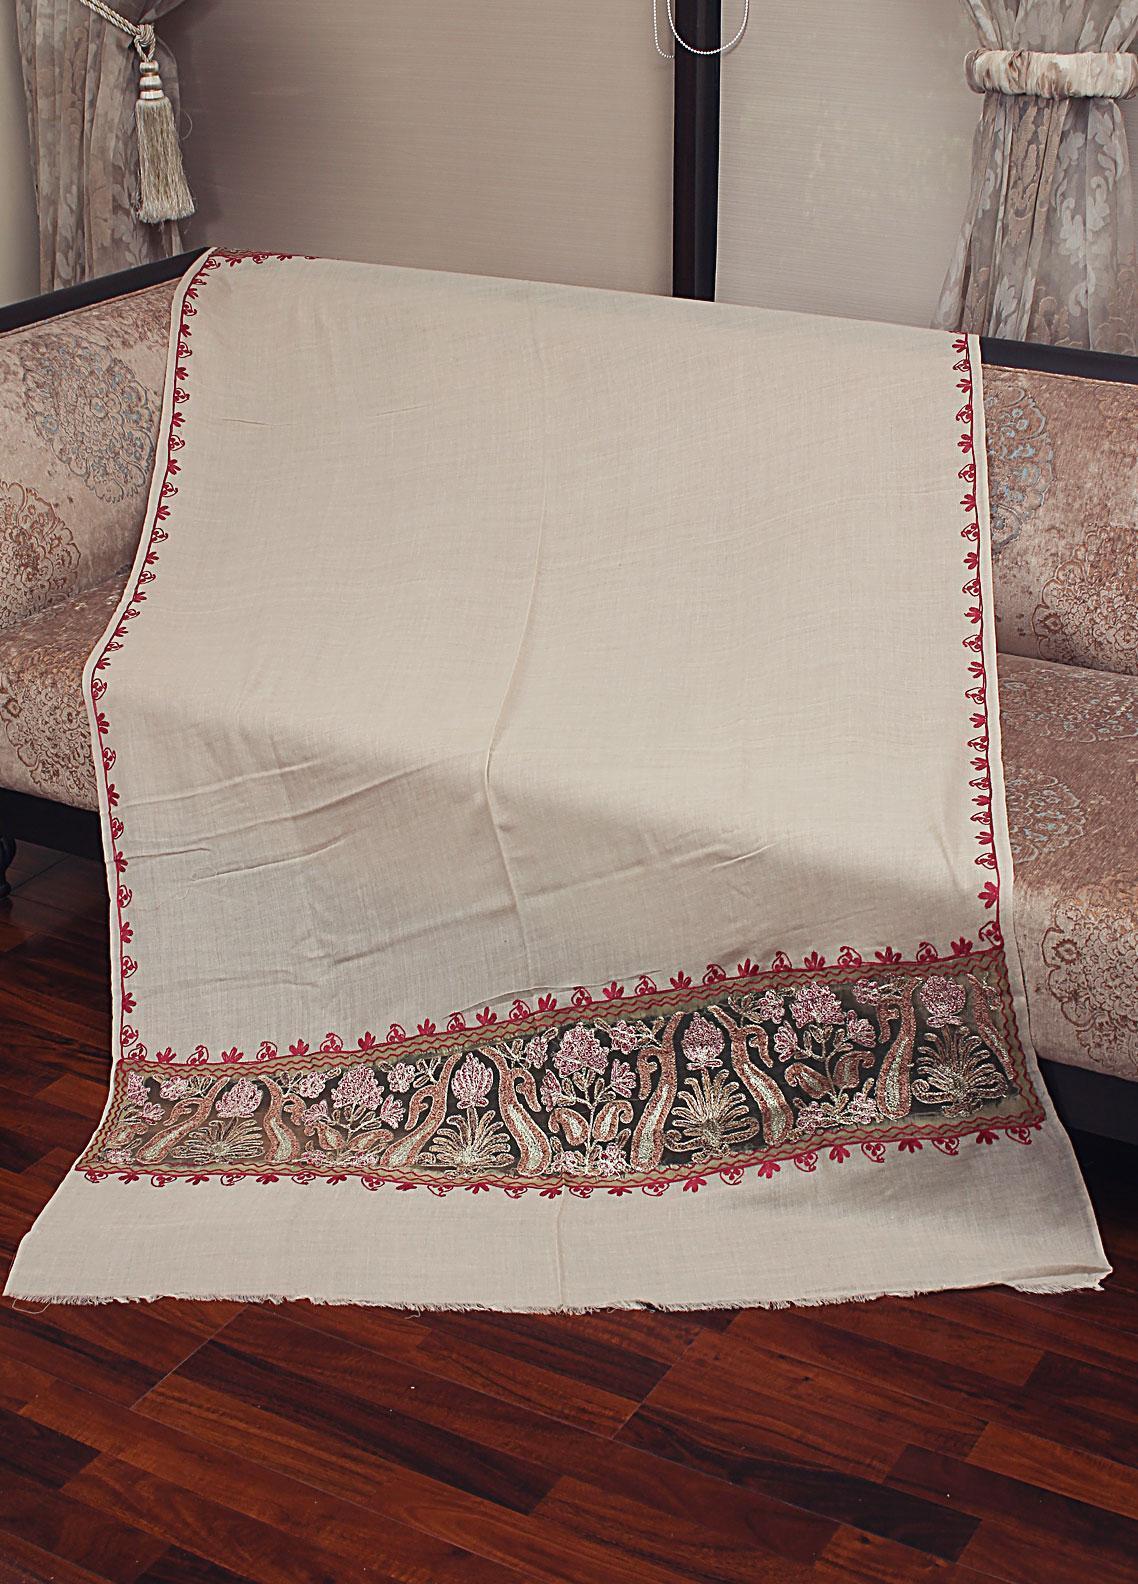 Sanaulla Exclusive Range Cut Work Embroidered Pashmina  Shawl 19-MIR-366 Fawn - Kashmiri Shawls